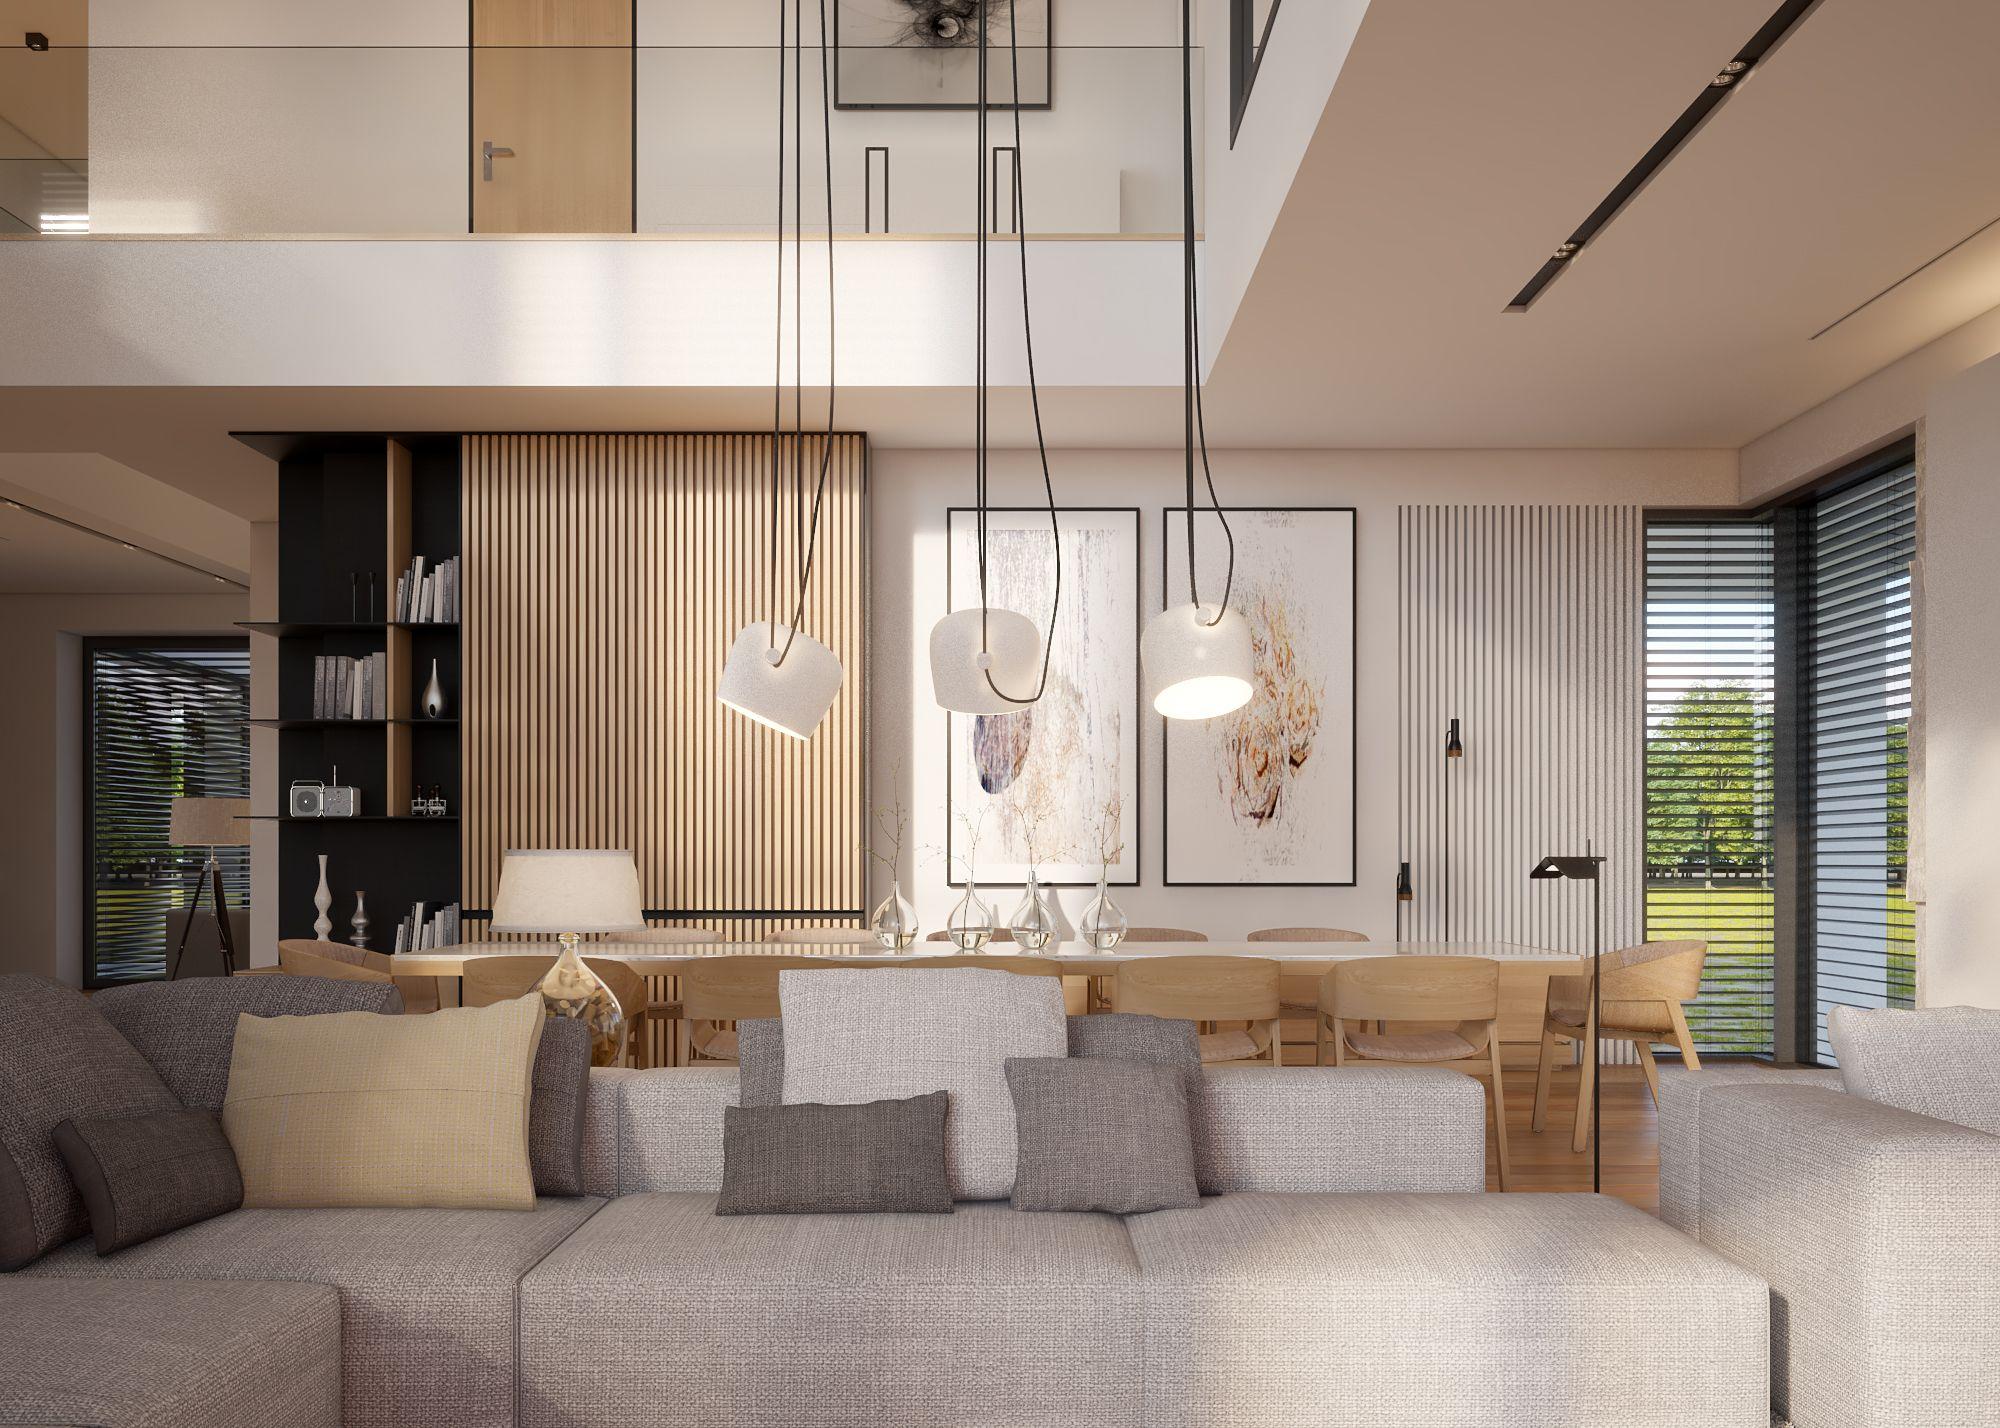 Modern Interieur Warm : Warm modern interior design vis for lk projekt pl on behance